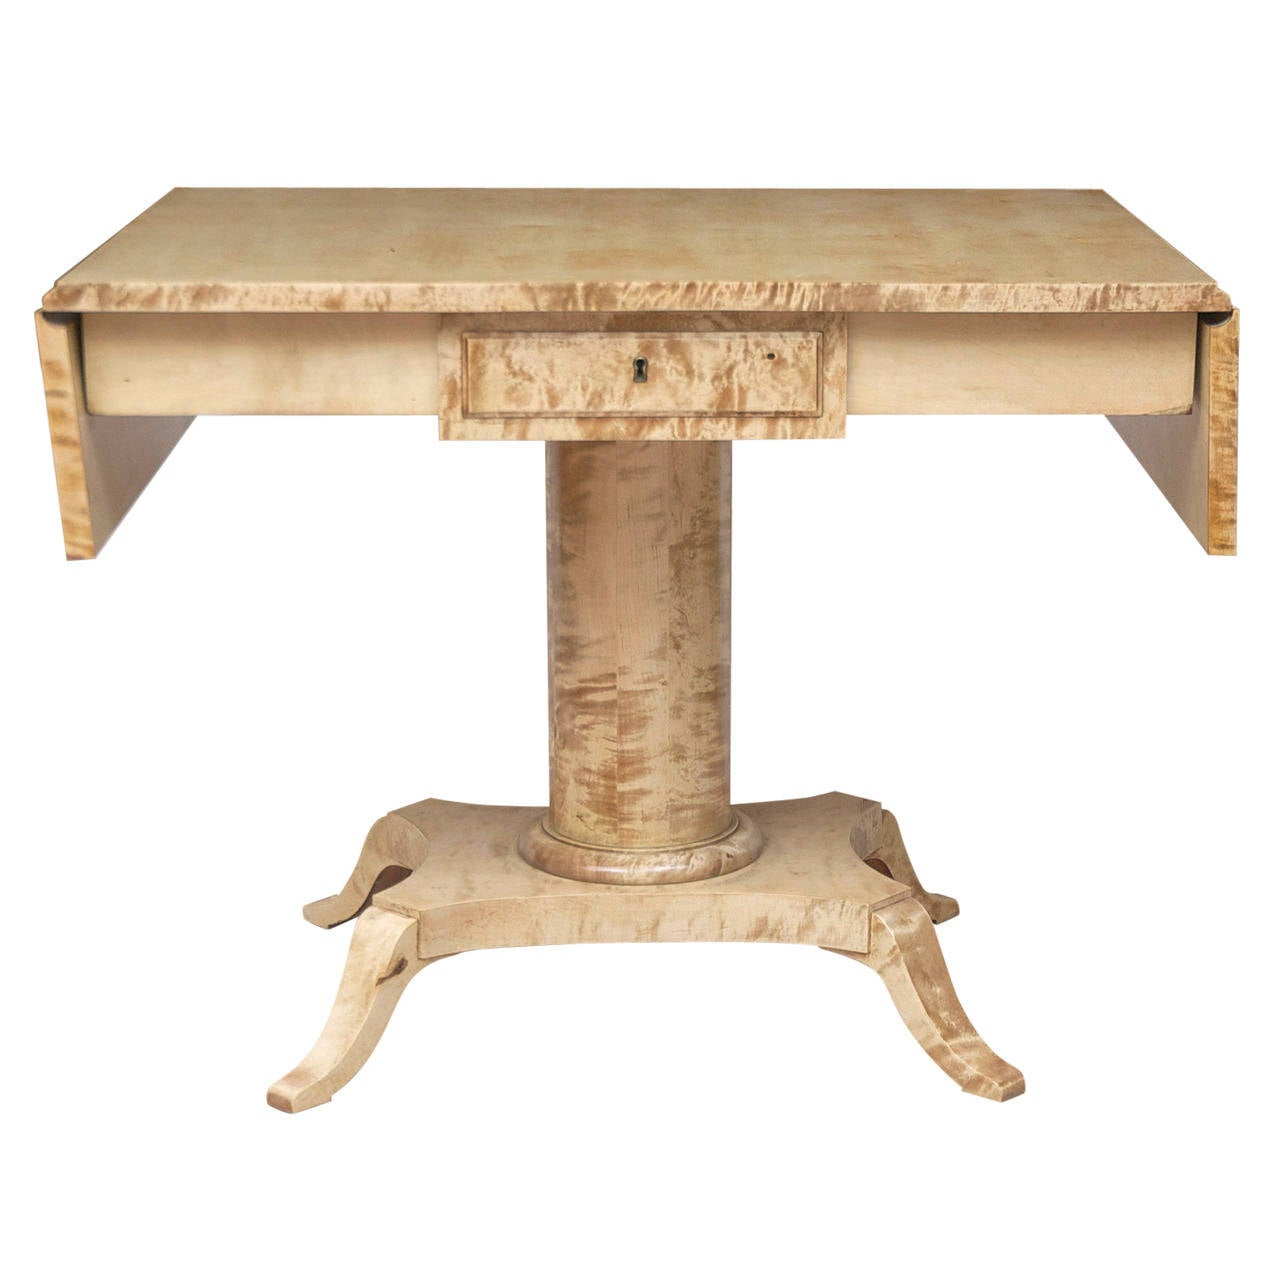 Biedermeier Style Ivory-Tone Sofa or Writing Table in Birch